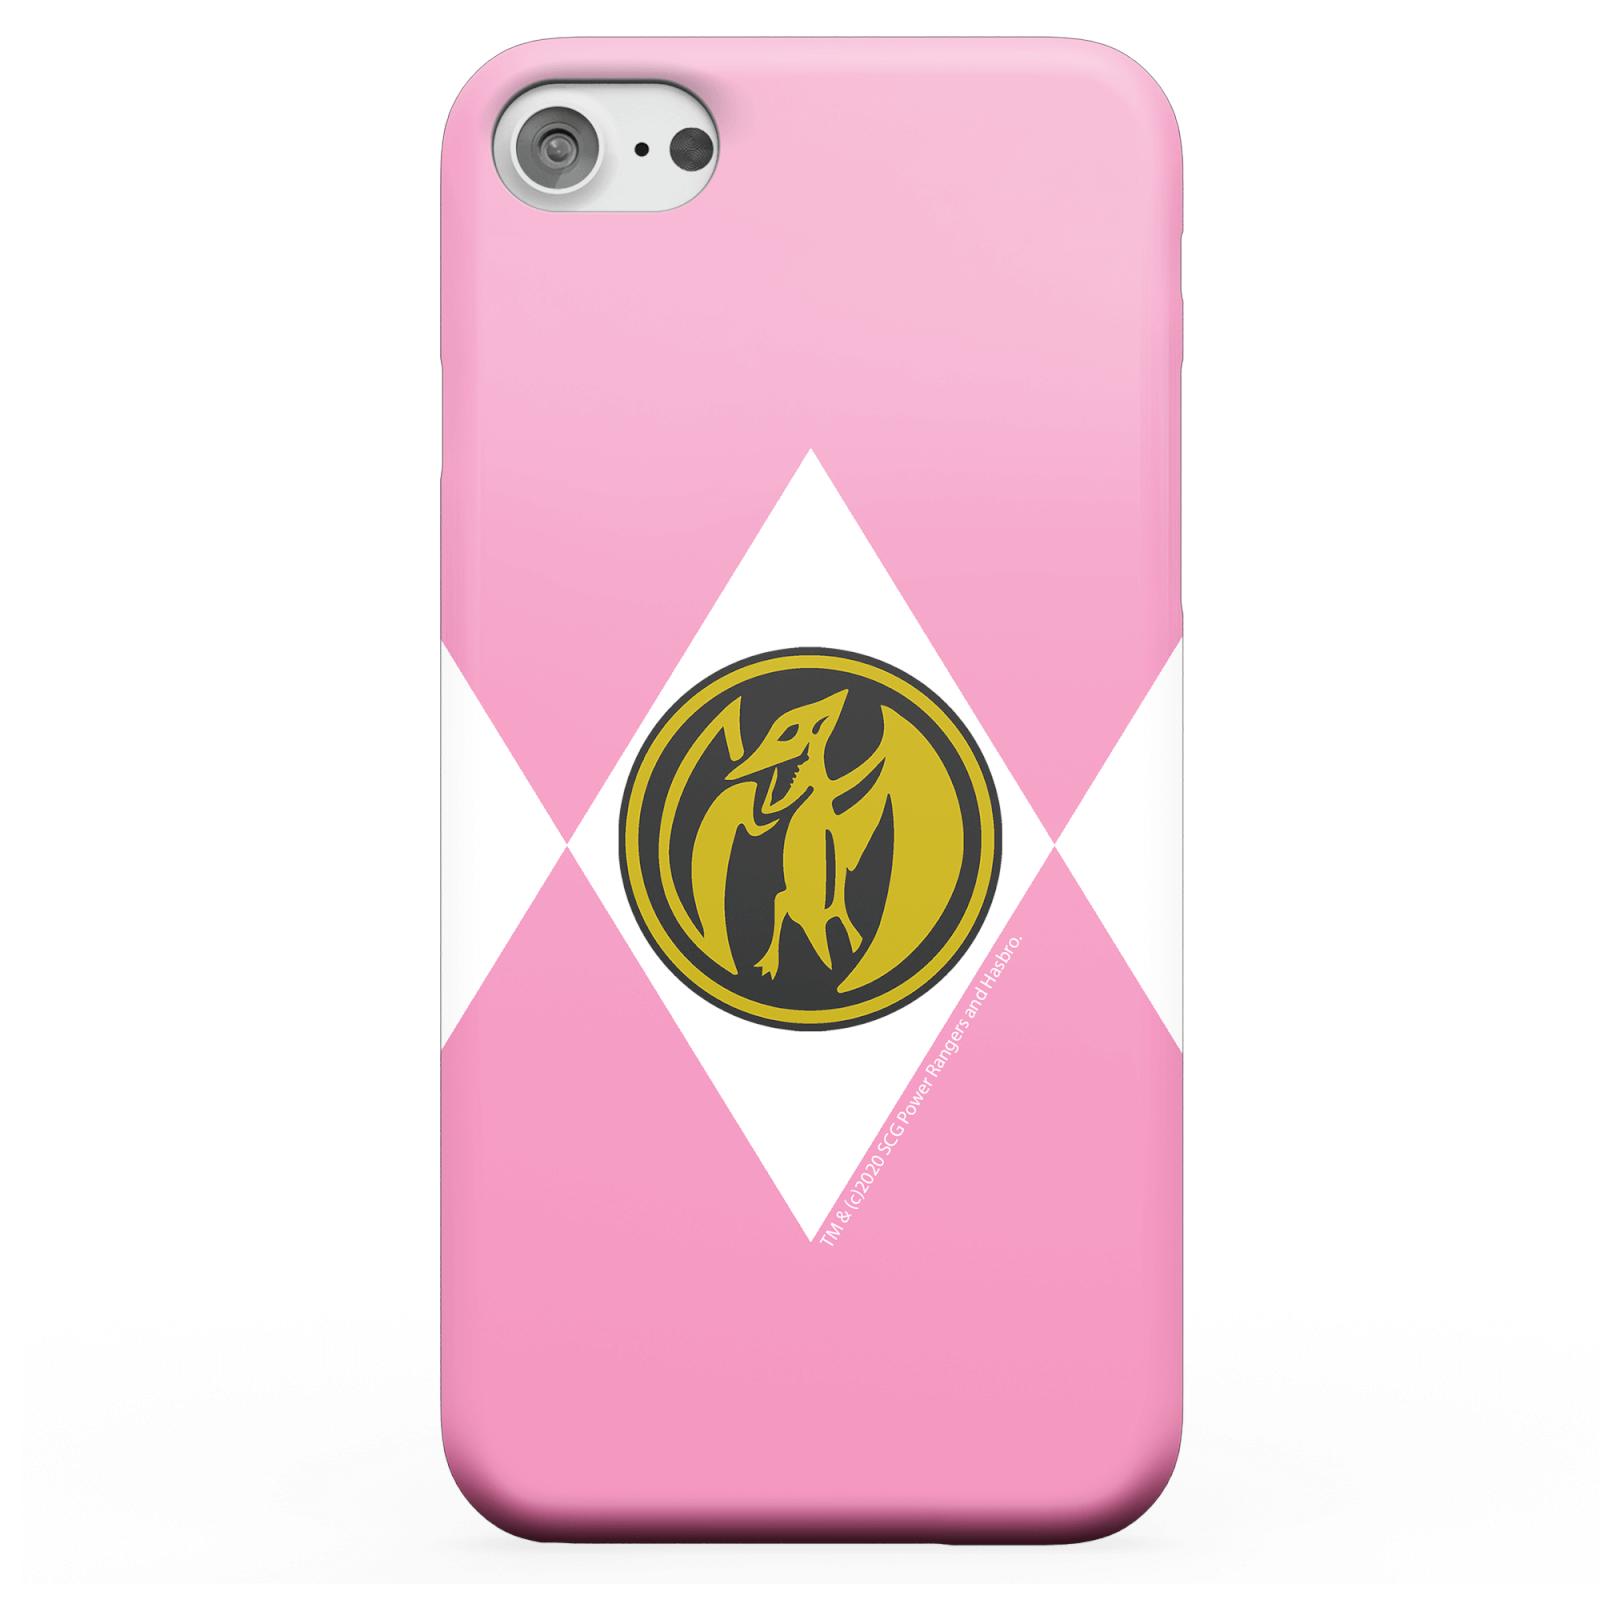 Power Rangers Pterodactyl Smartphone Hülle für Android und iPhone - iPhone 6 Plus - Snap Hülle Matt